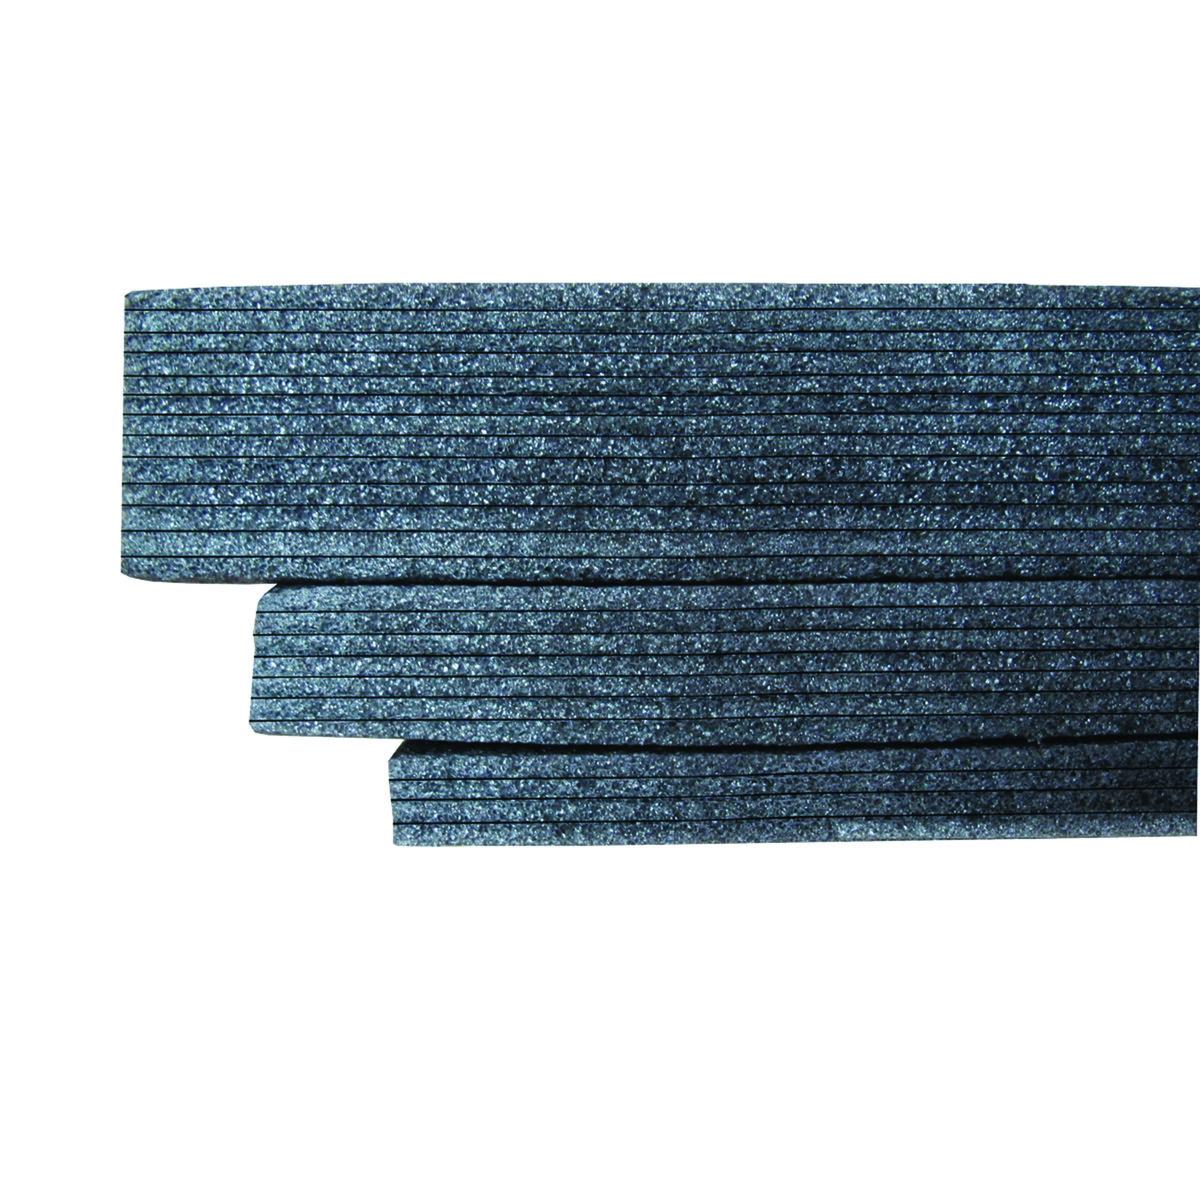 "View a Larger Image of Kaizen Foam 57mm (2-1/4"") Black"